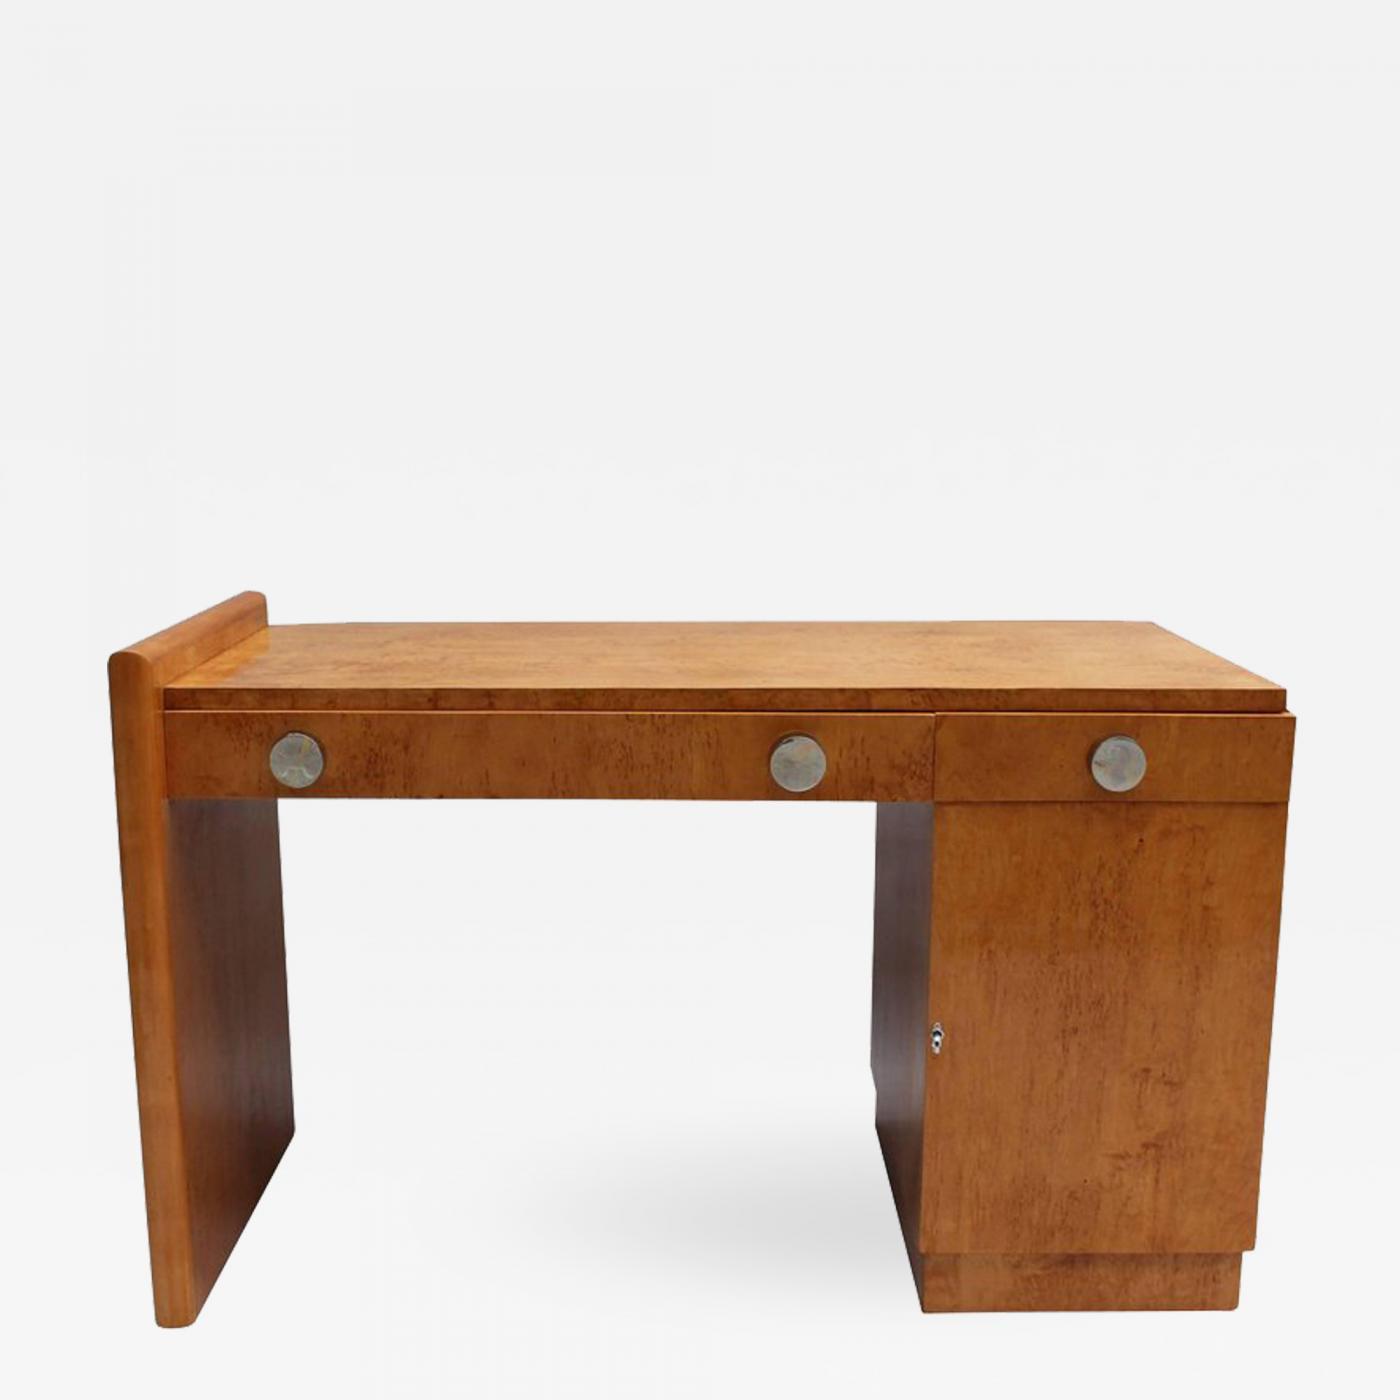 Astonishing Fine French Art Deco Birch Desk With Chrome Details Download Free Architecture Designs Scobabritishbridgeorg